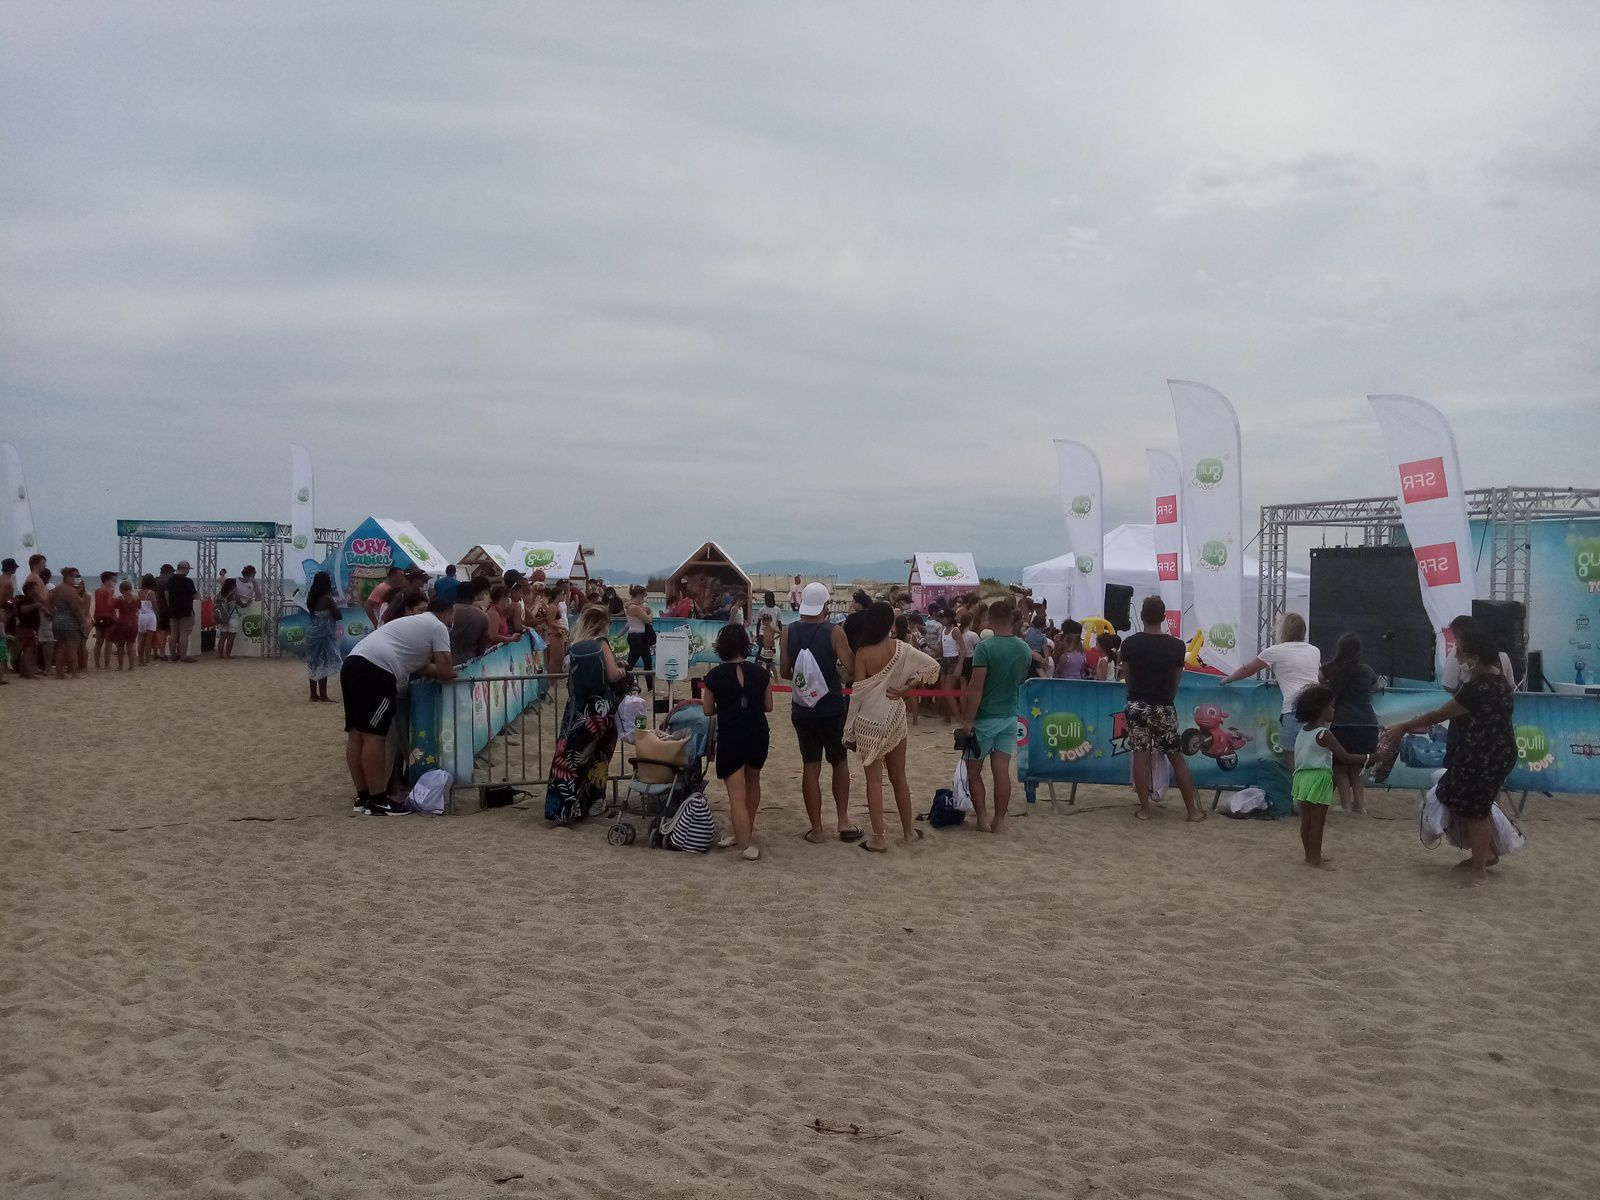 Gulli tour à Leucate plage